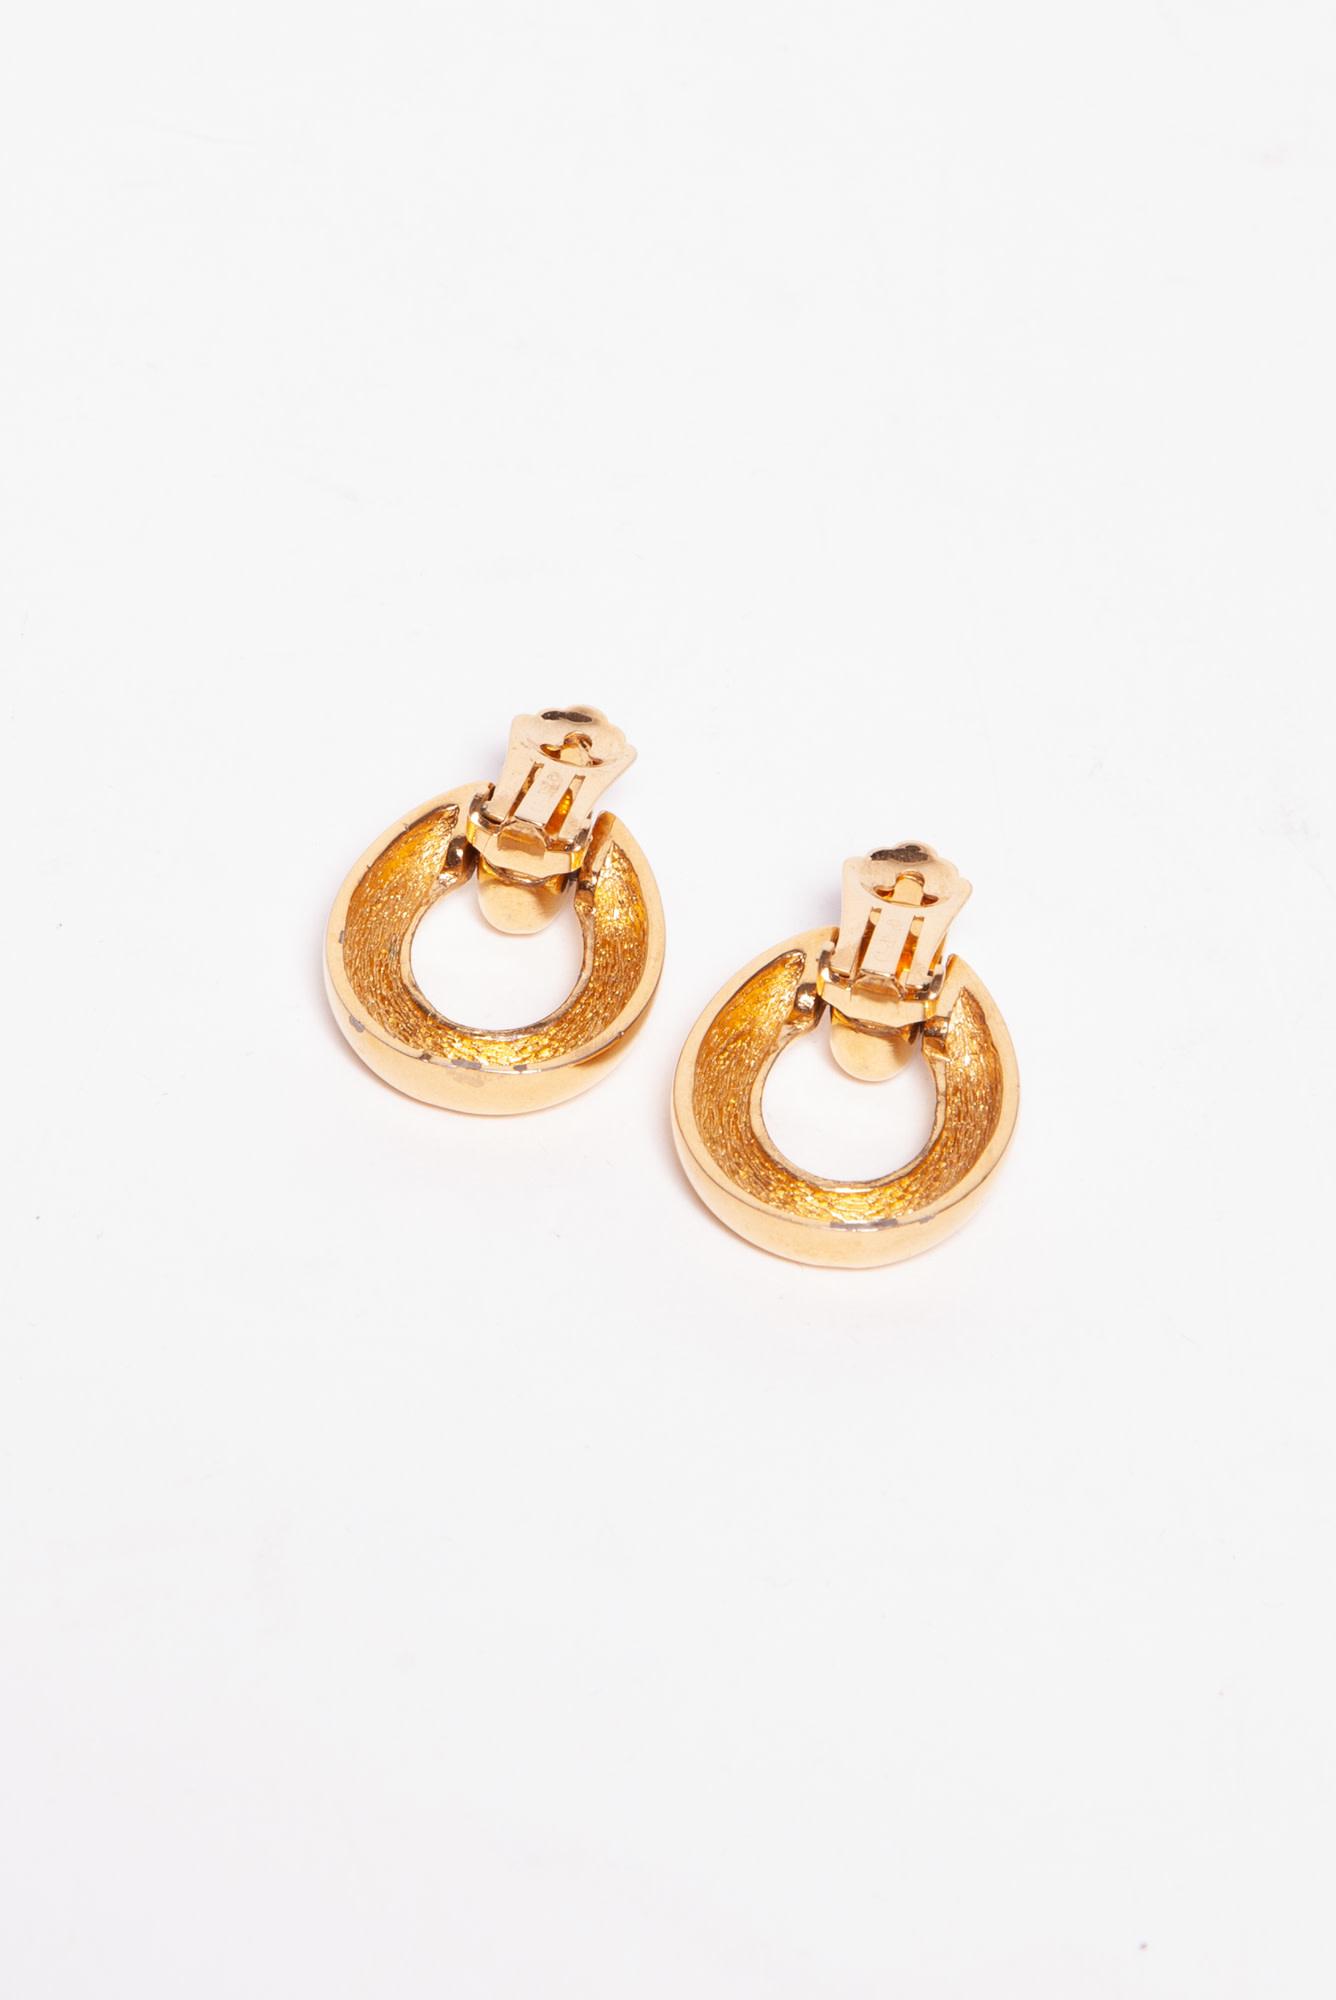 Christian Dior GOLDEN PLATED EARRINGS